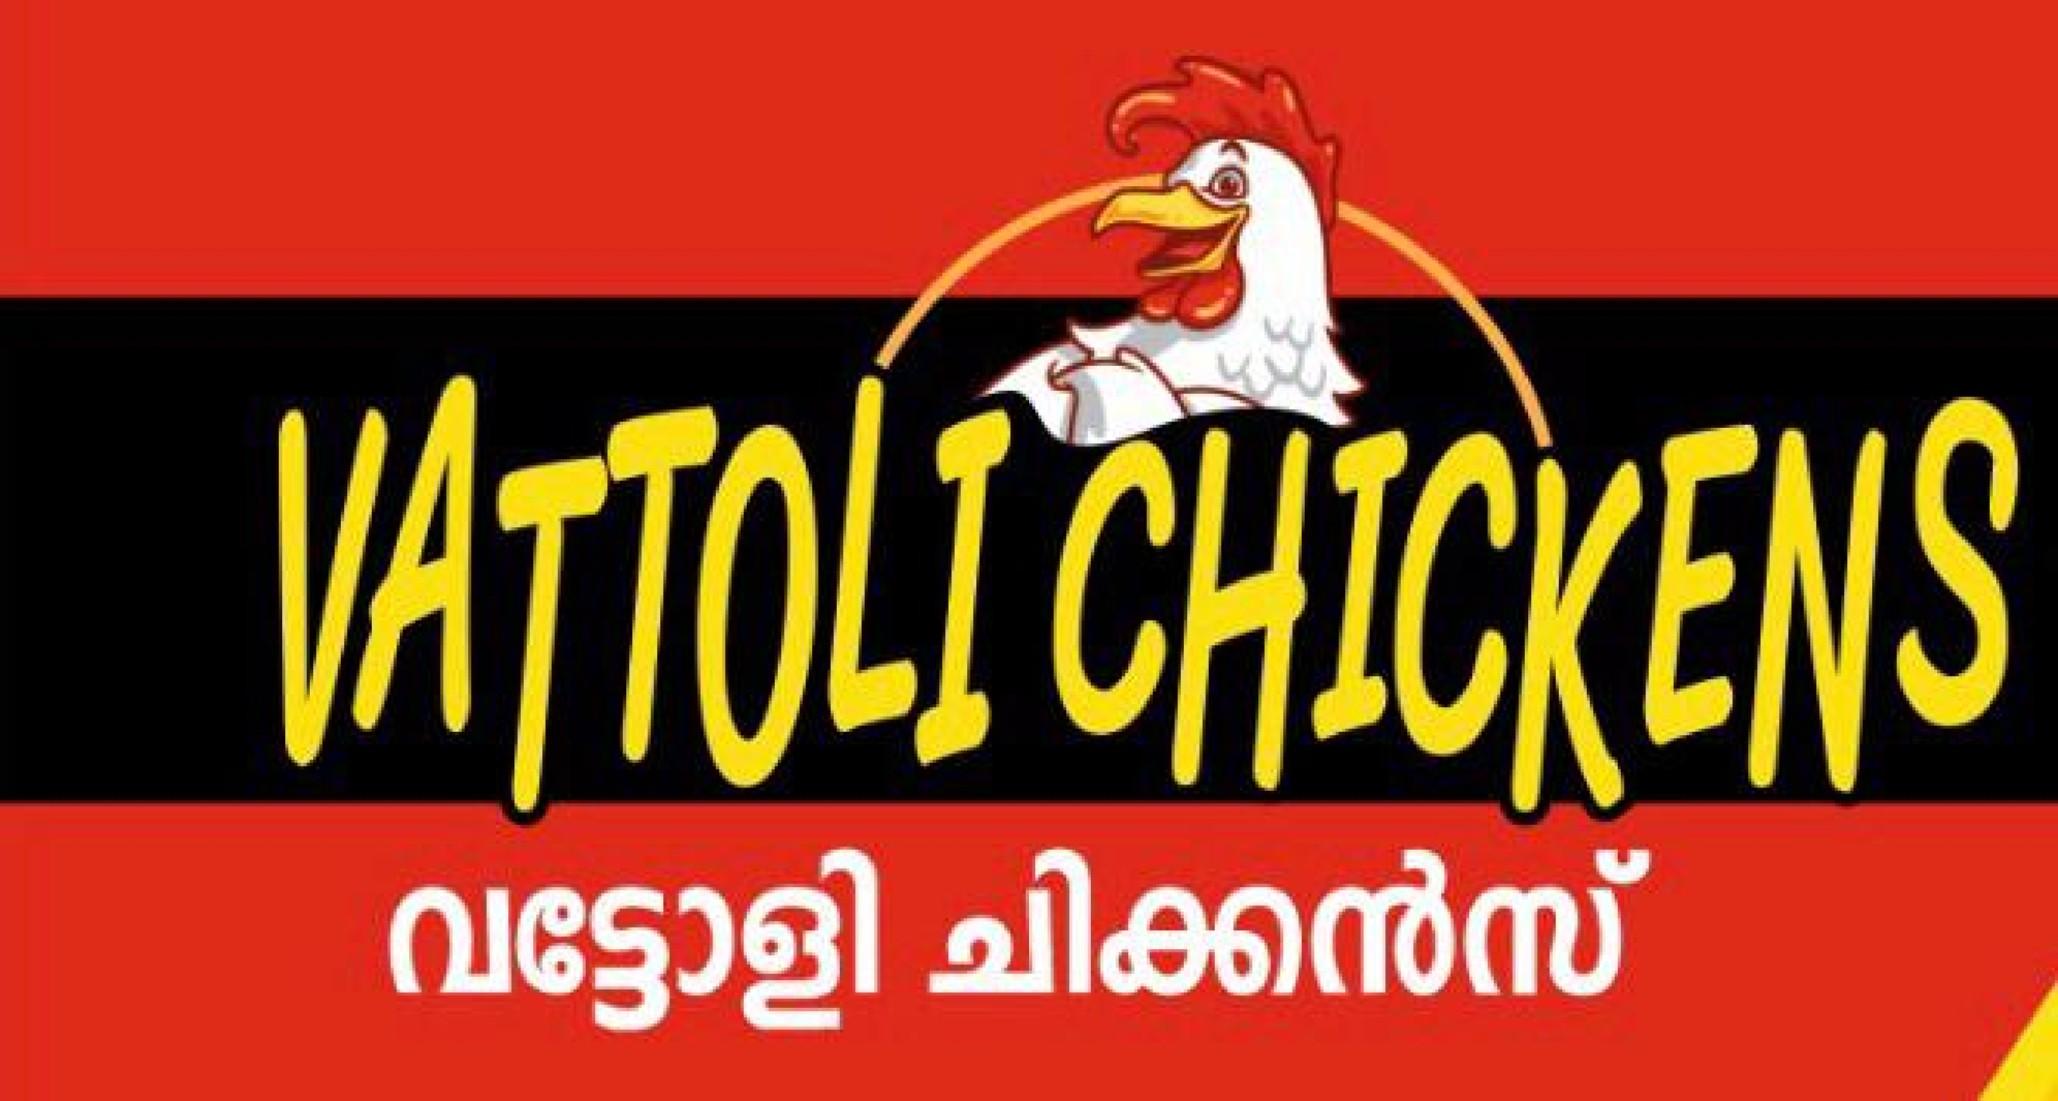 VATTOLI CHICKENS, MEAT & FISH,  service in Vattoli, Kozhikode